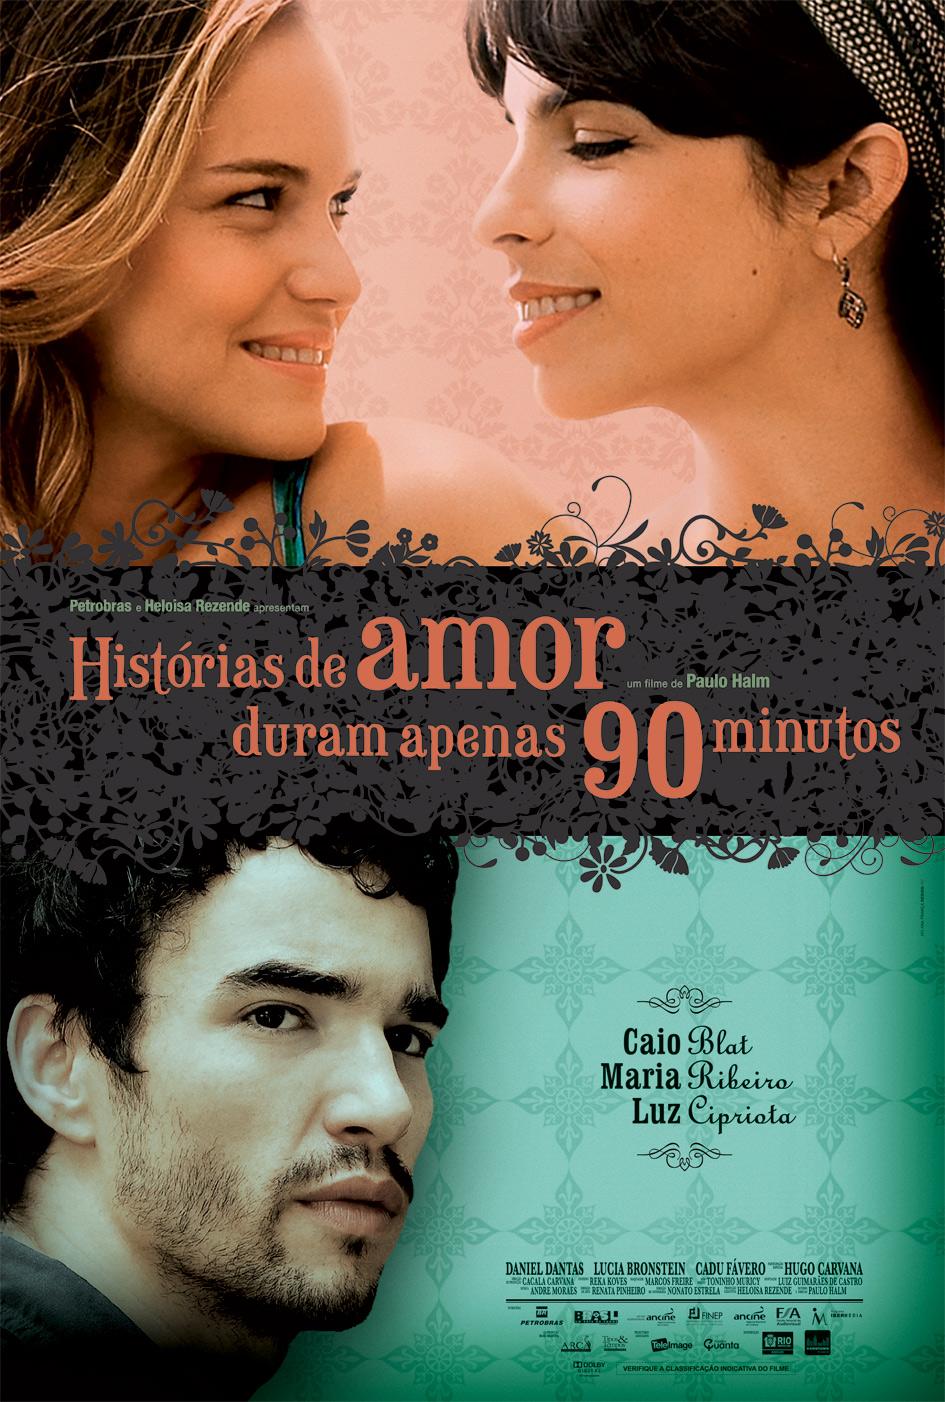 HISTORIAS-DE-AMOR.jpg